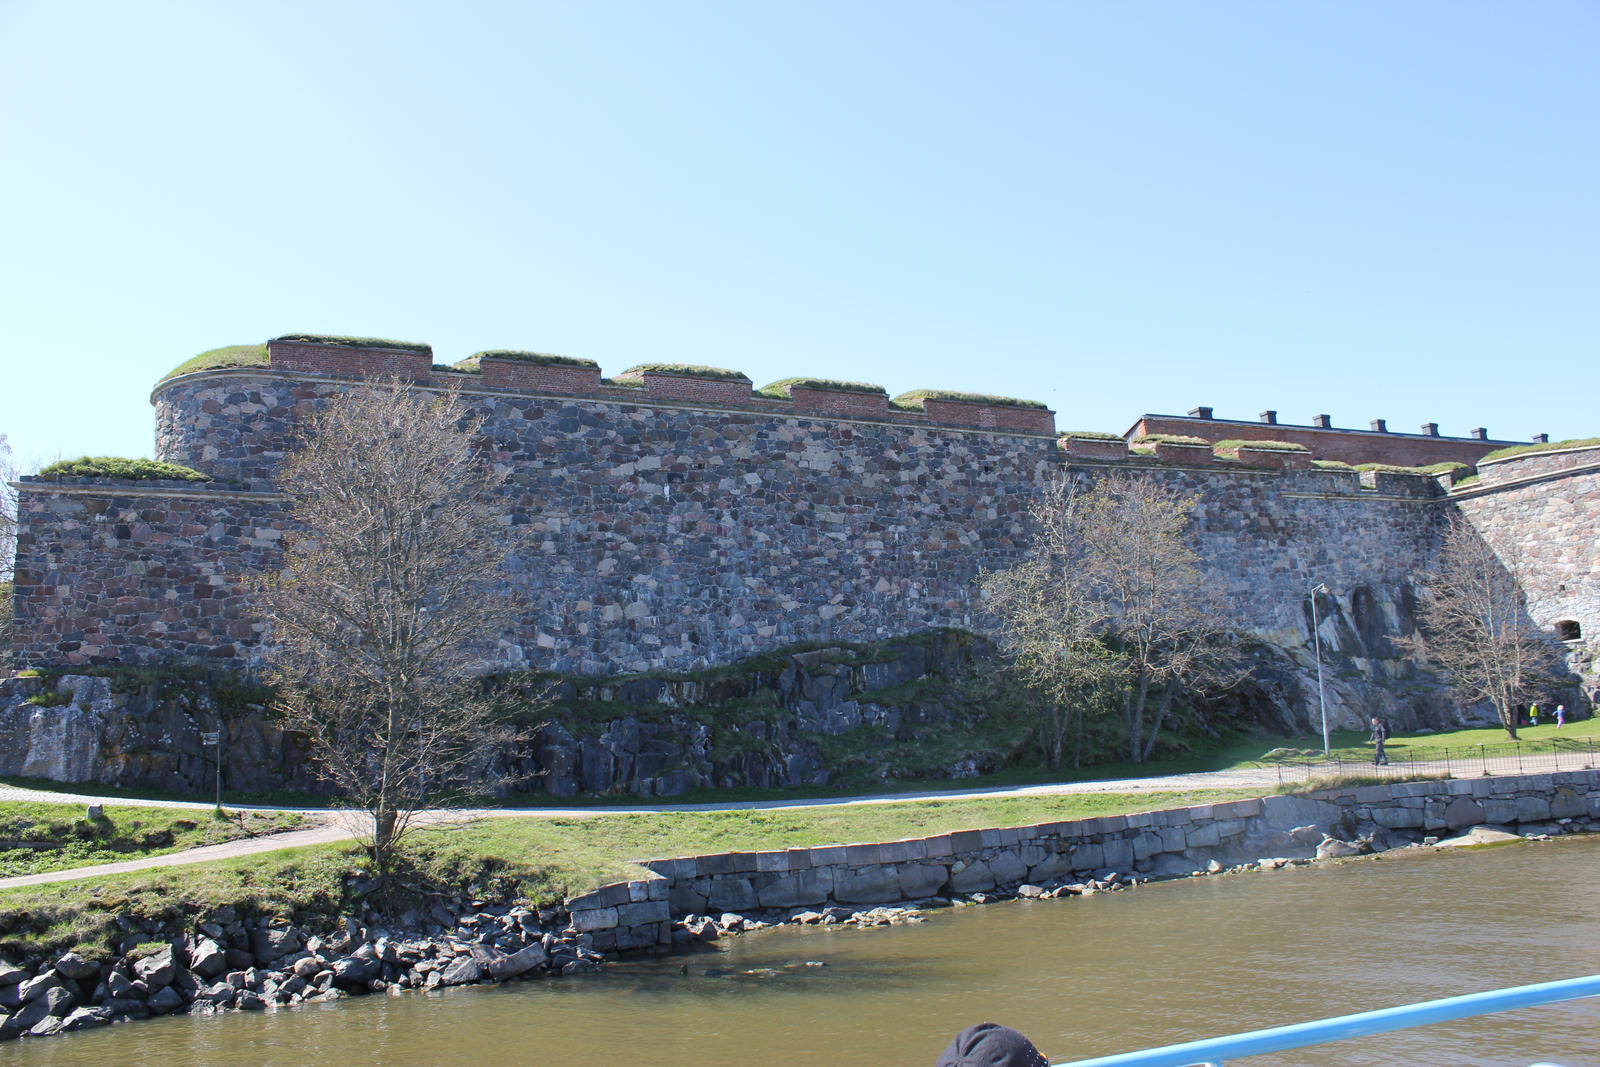 Suomen Linnan muurit by Darkkis91